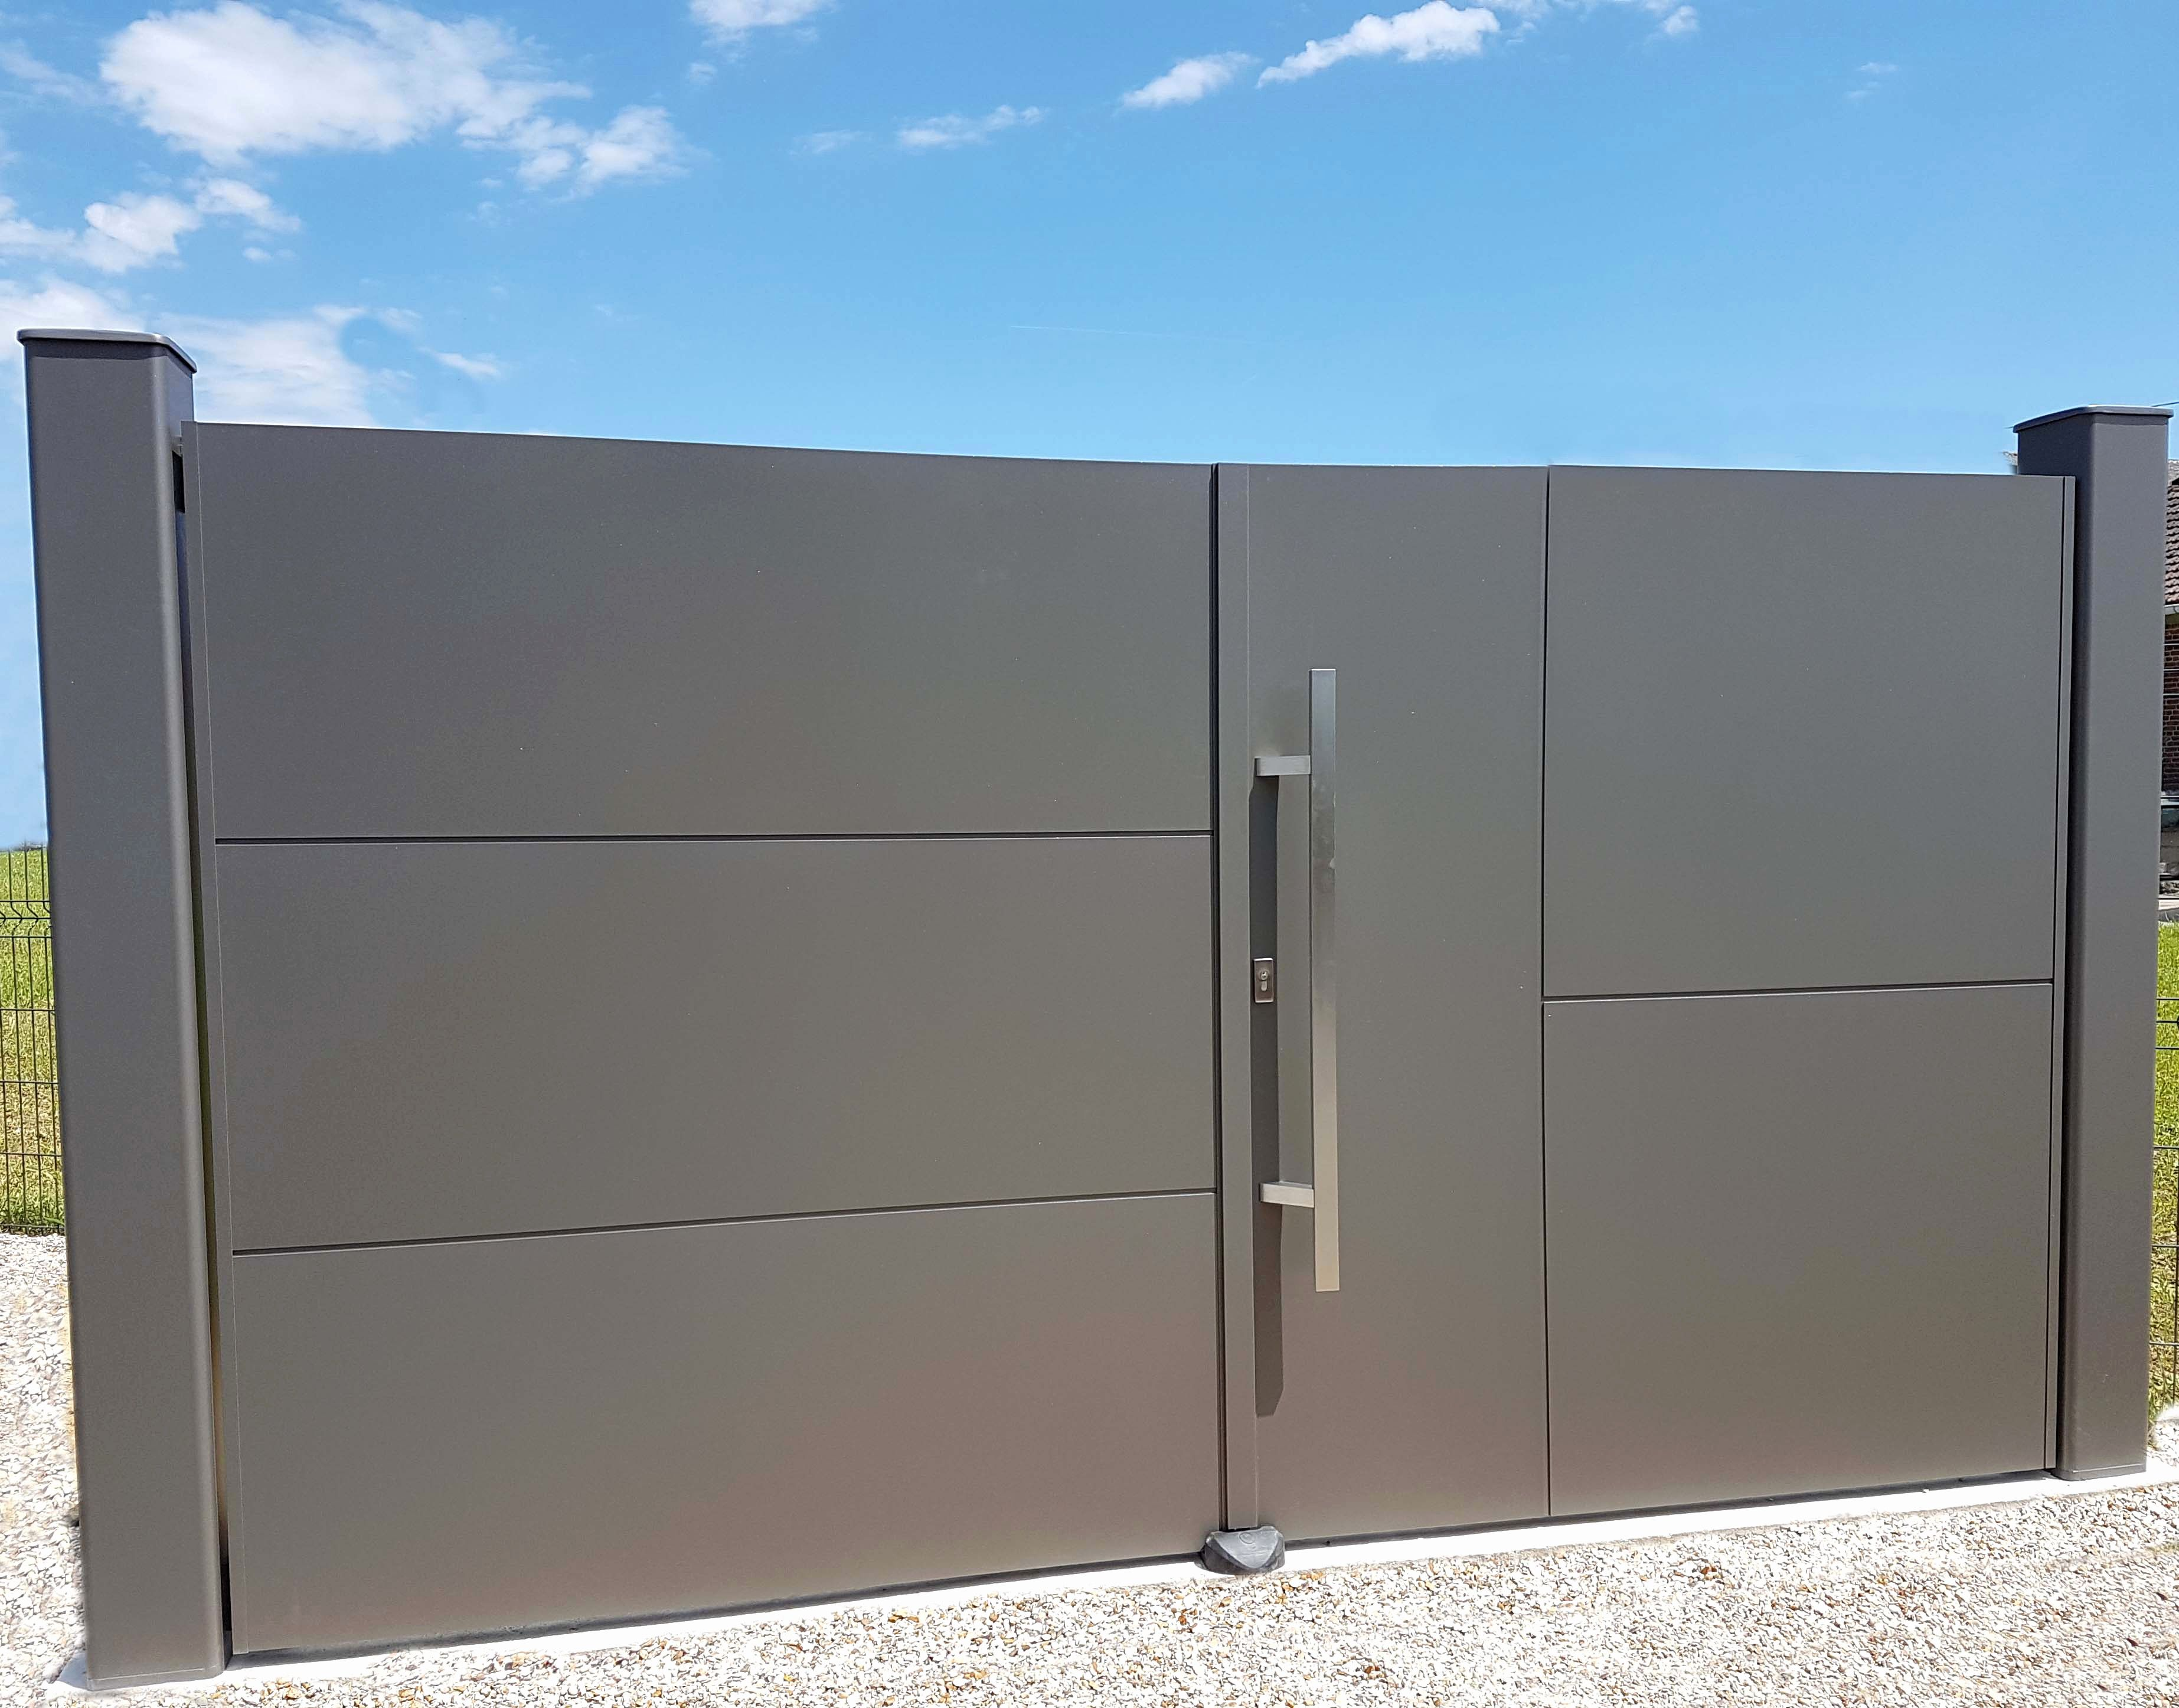 Luxury Portillon Sur Mesure Castorama Main Gate Design Entrance Gates Design Gate Design